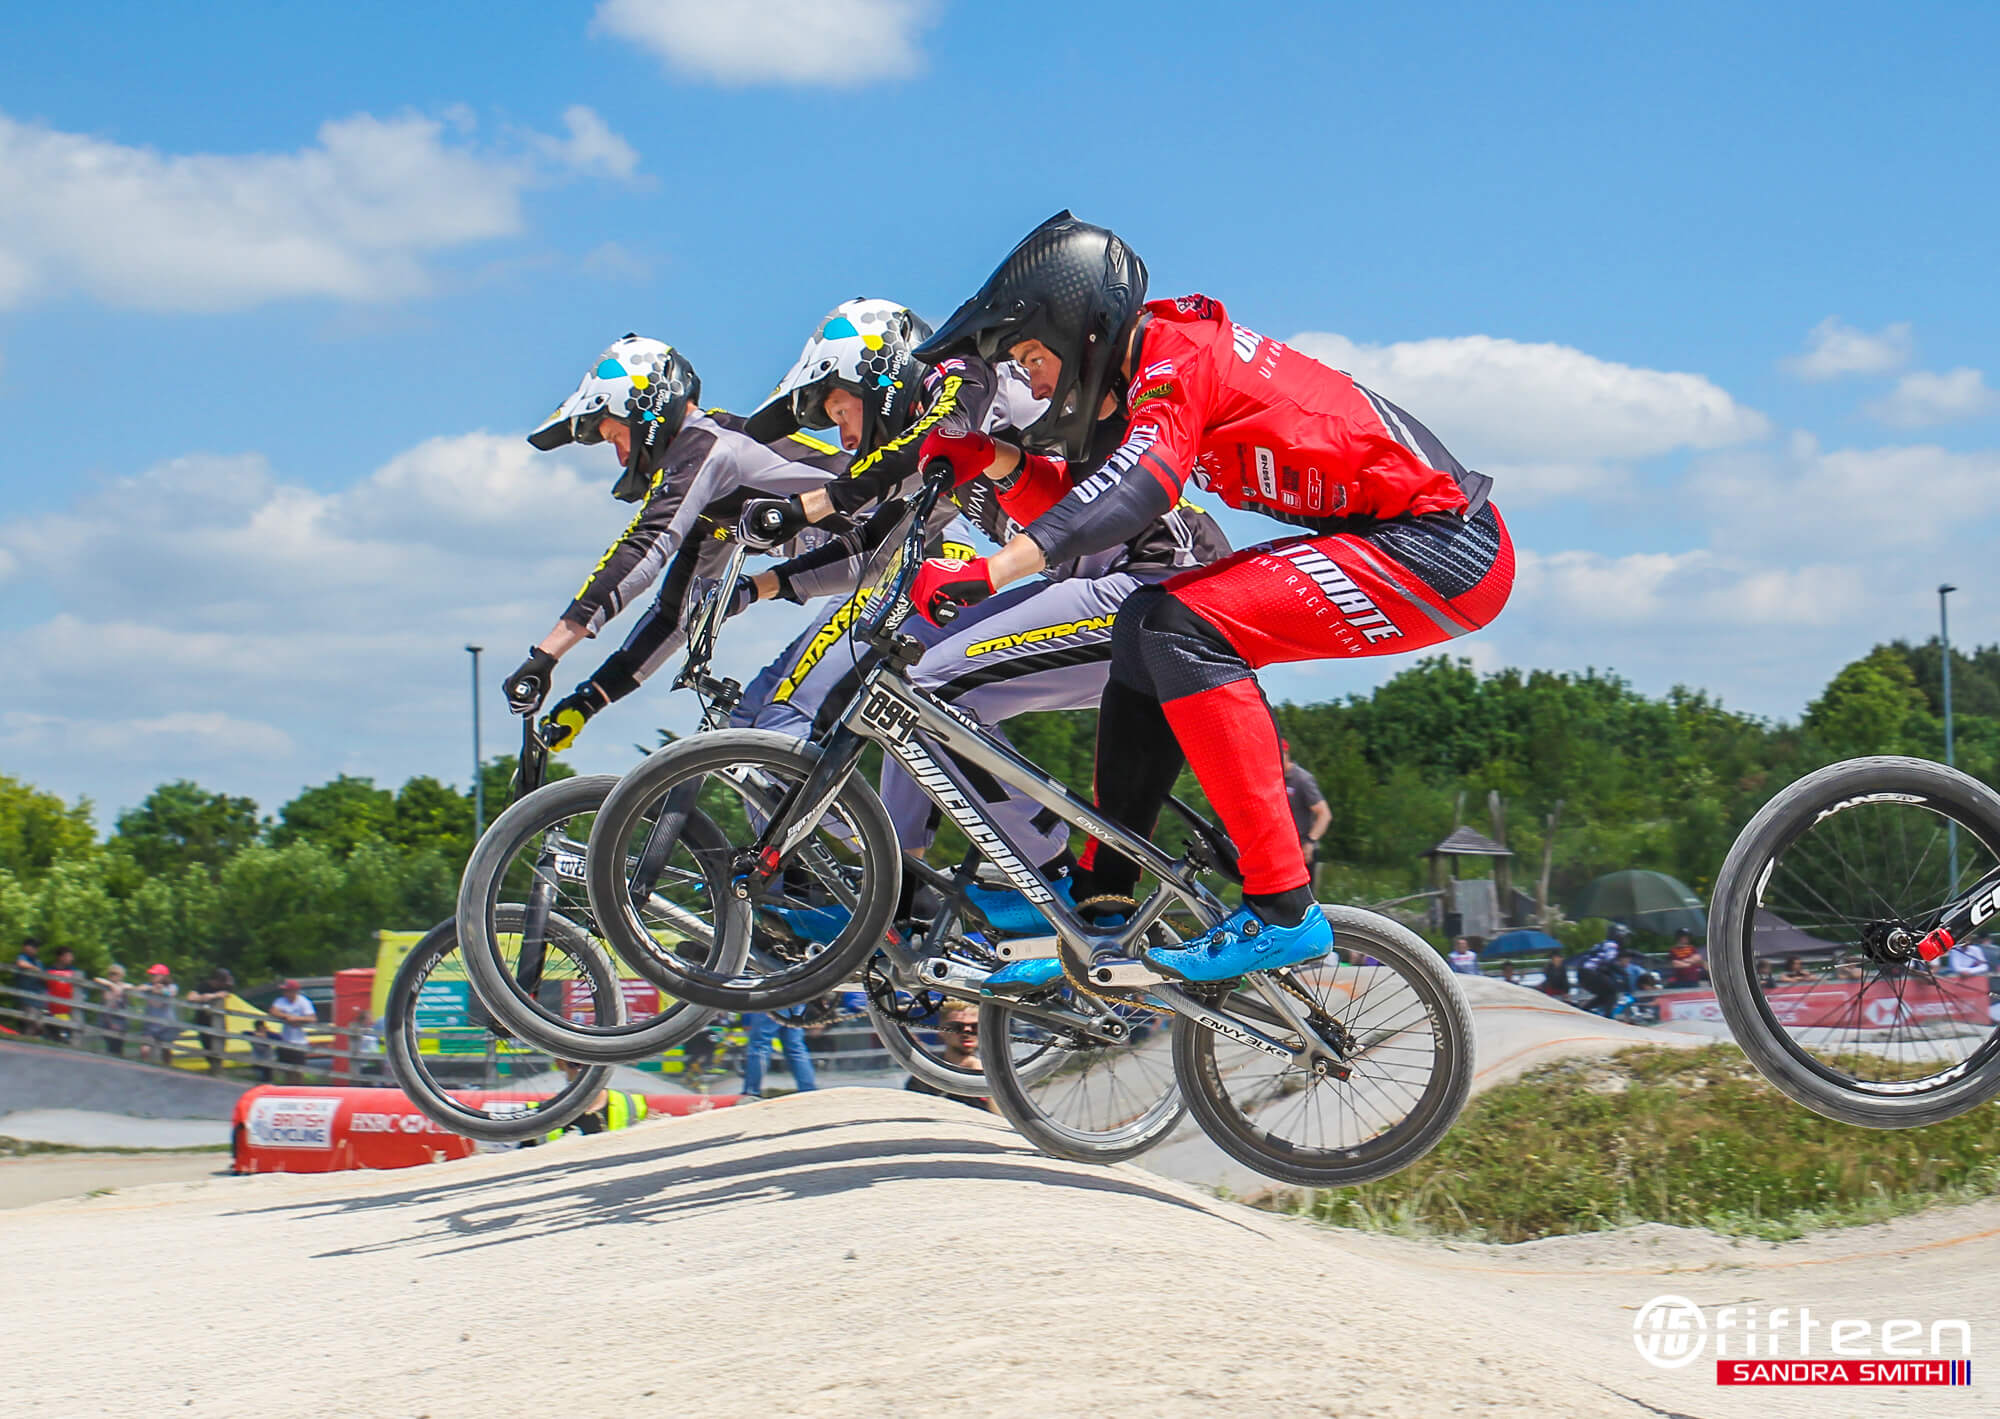 British BMX Series 2021 Cyclopark - Sandra Smith